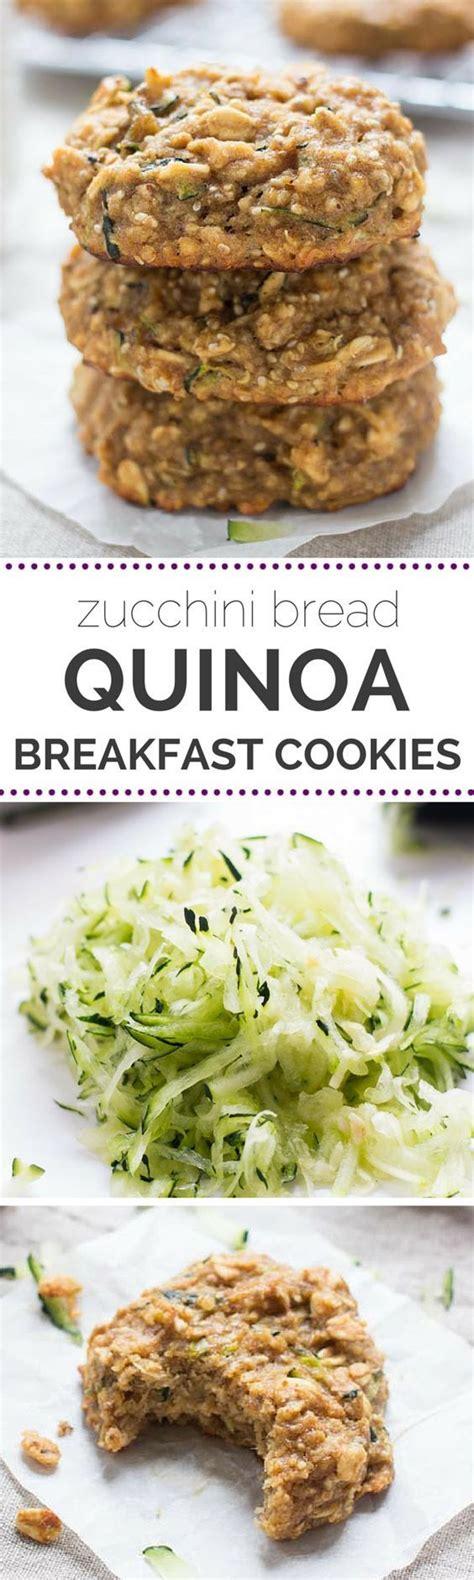 cuisiner le sarrasin zucchini bread quinoa breakfast cookies recette